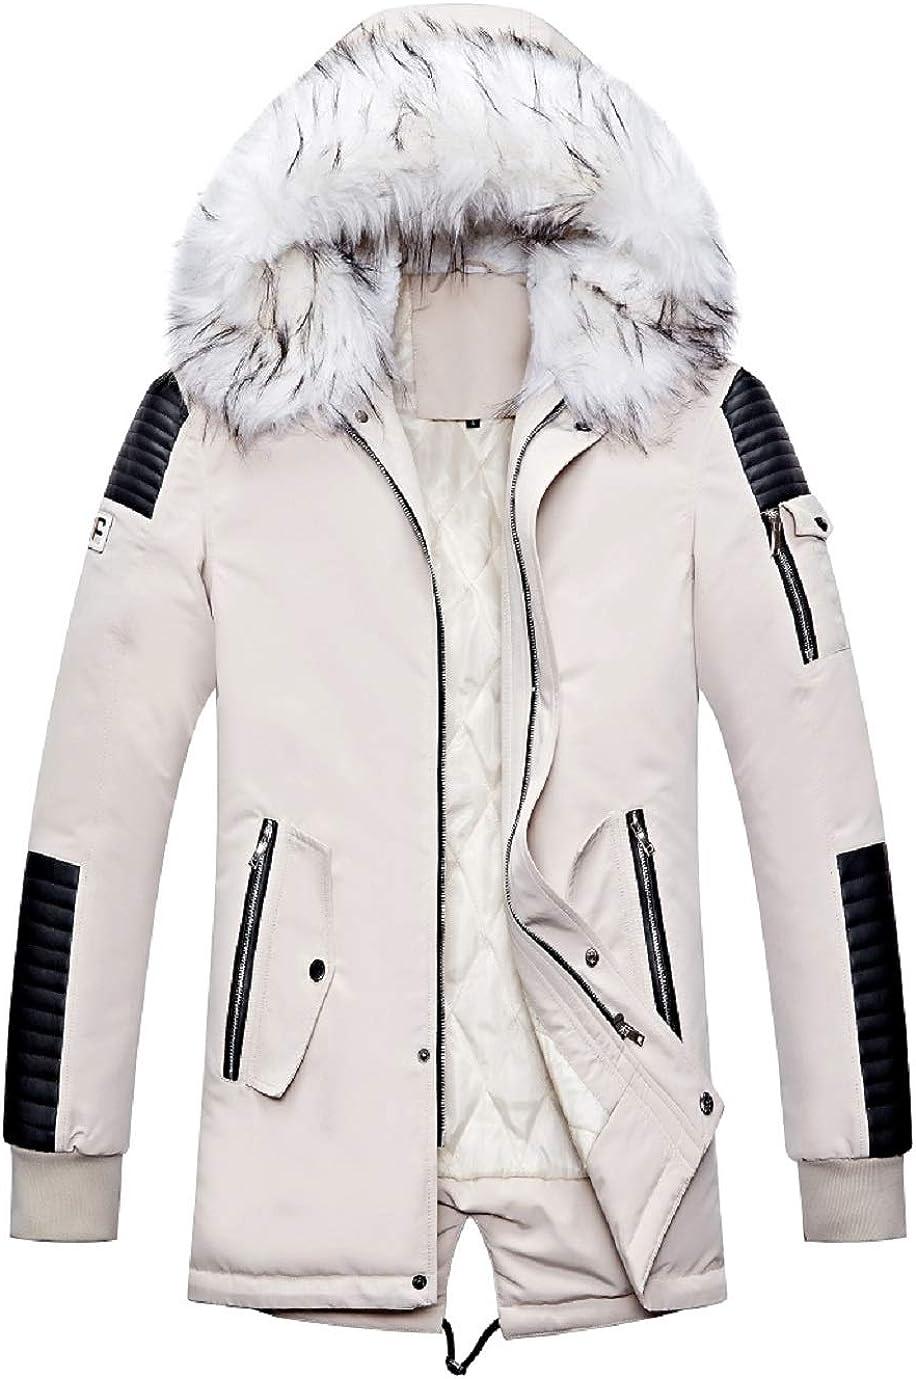 CHARTOU Men's Winter Detachable Faux Fur Hooded Spliced Midi Down Alternative Parka